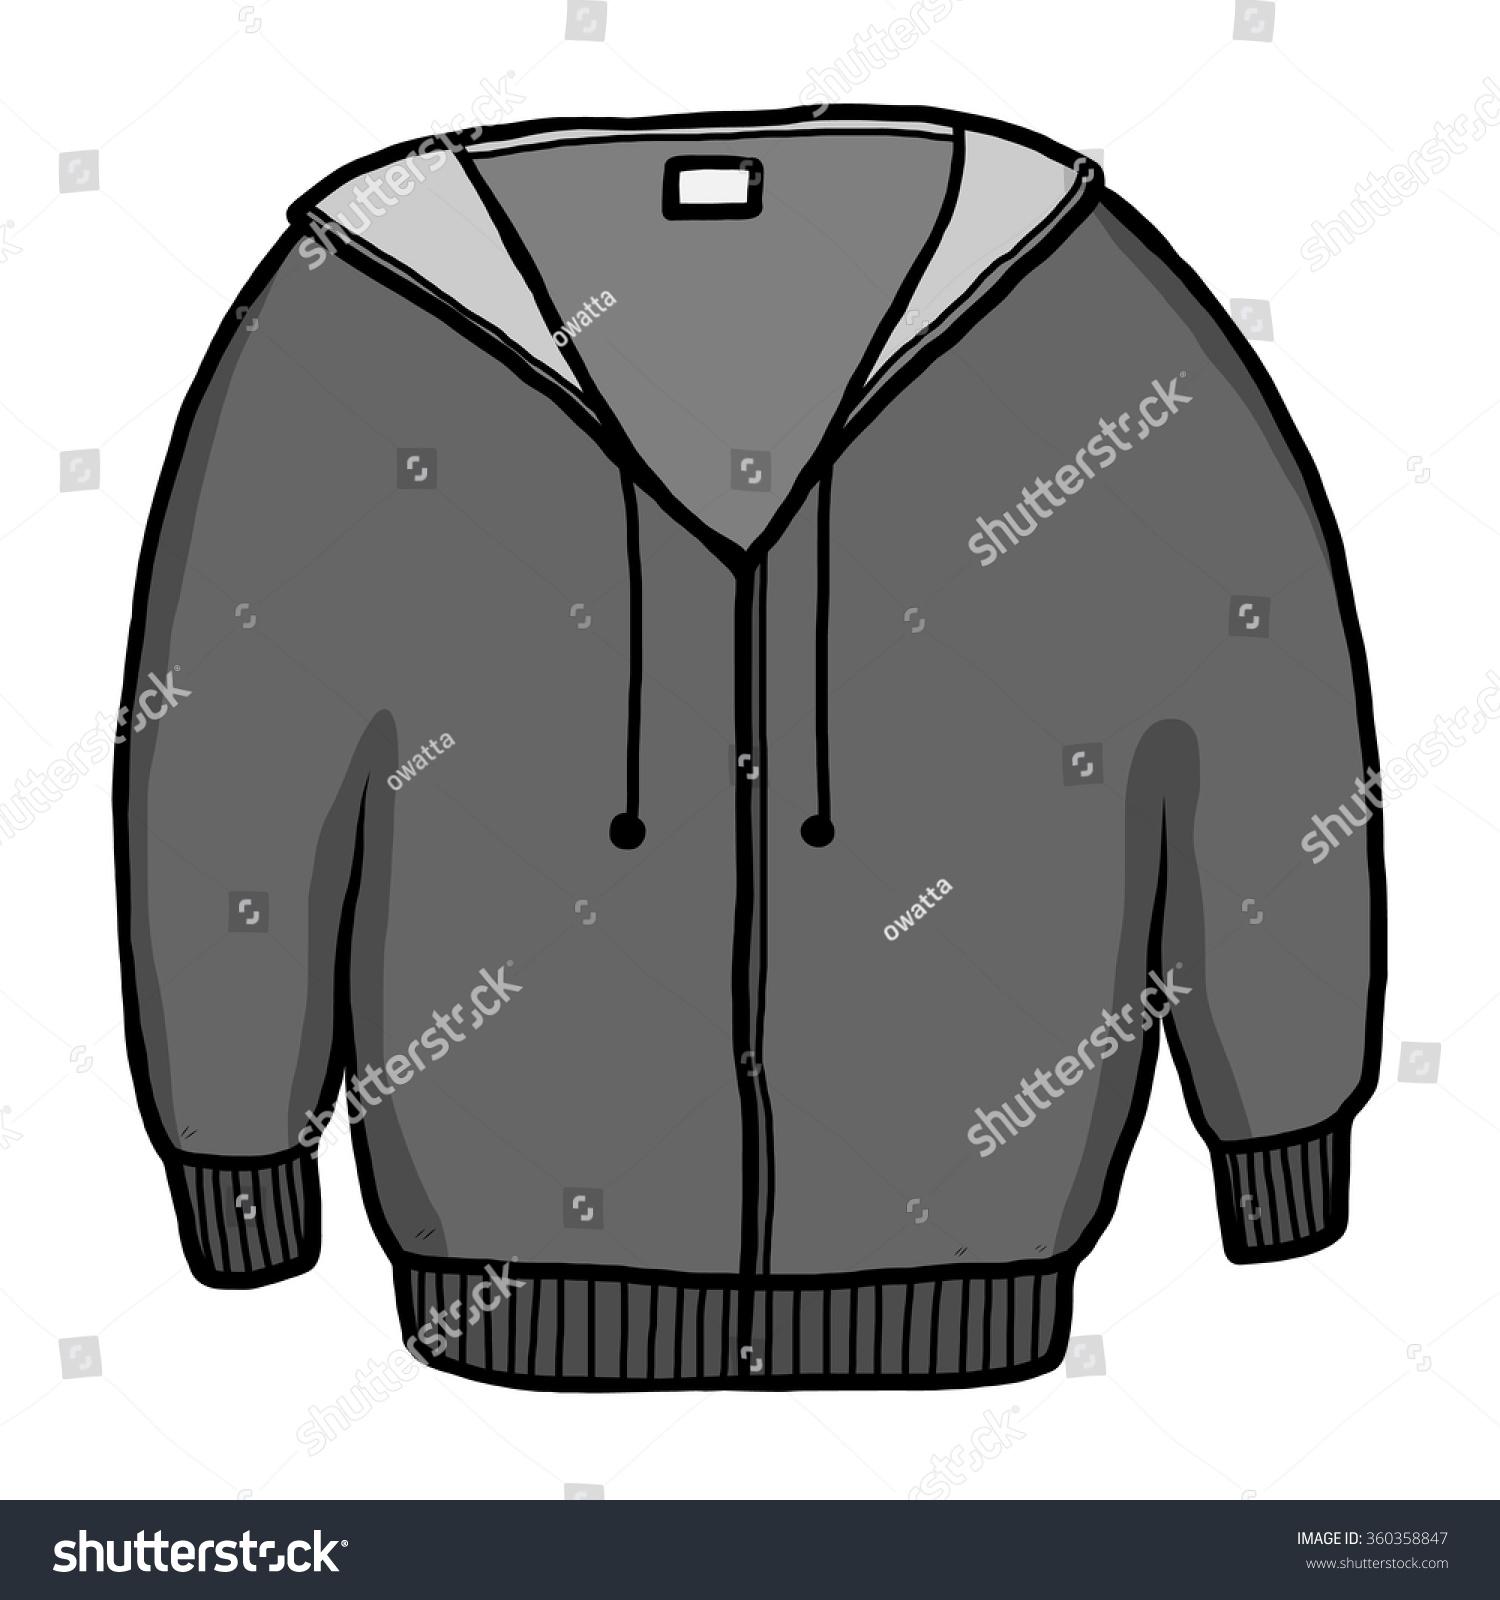 Jacket Sweater Cartoon Vector Illustration Grayscale Stock ...